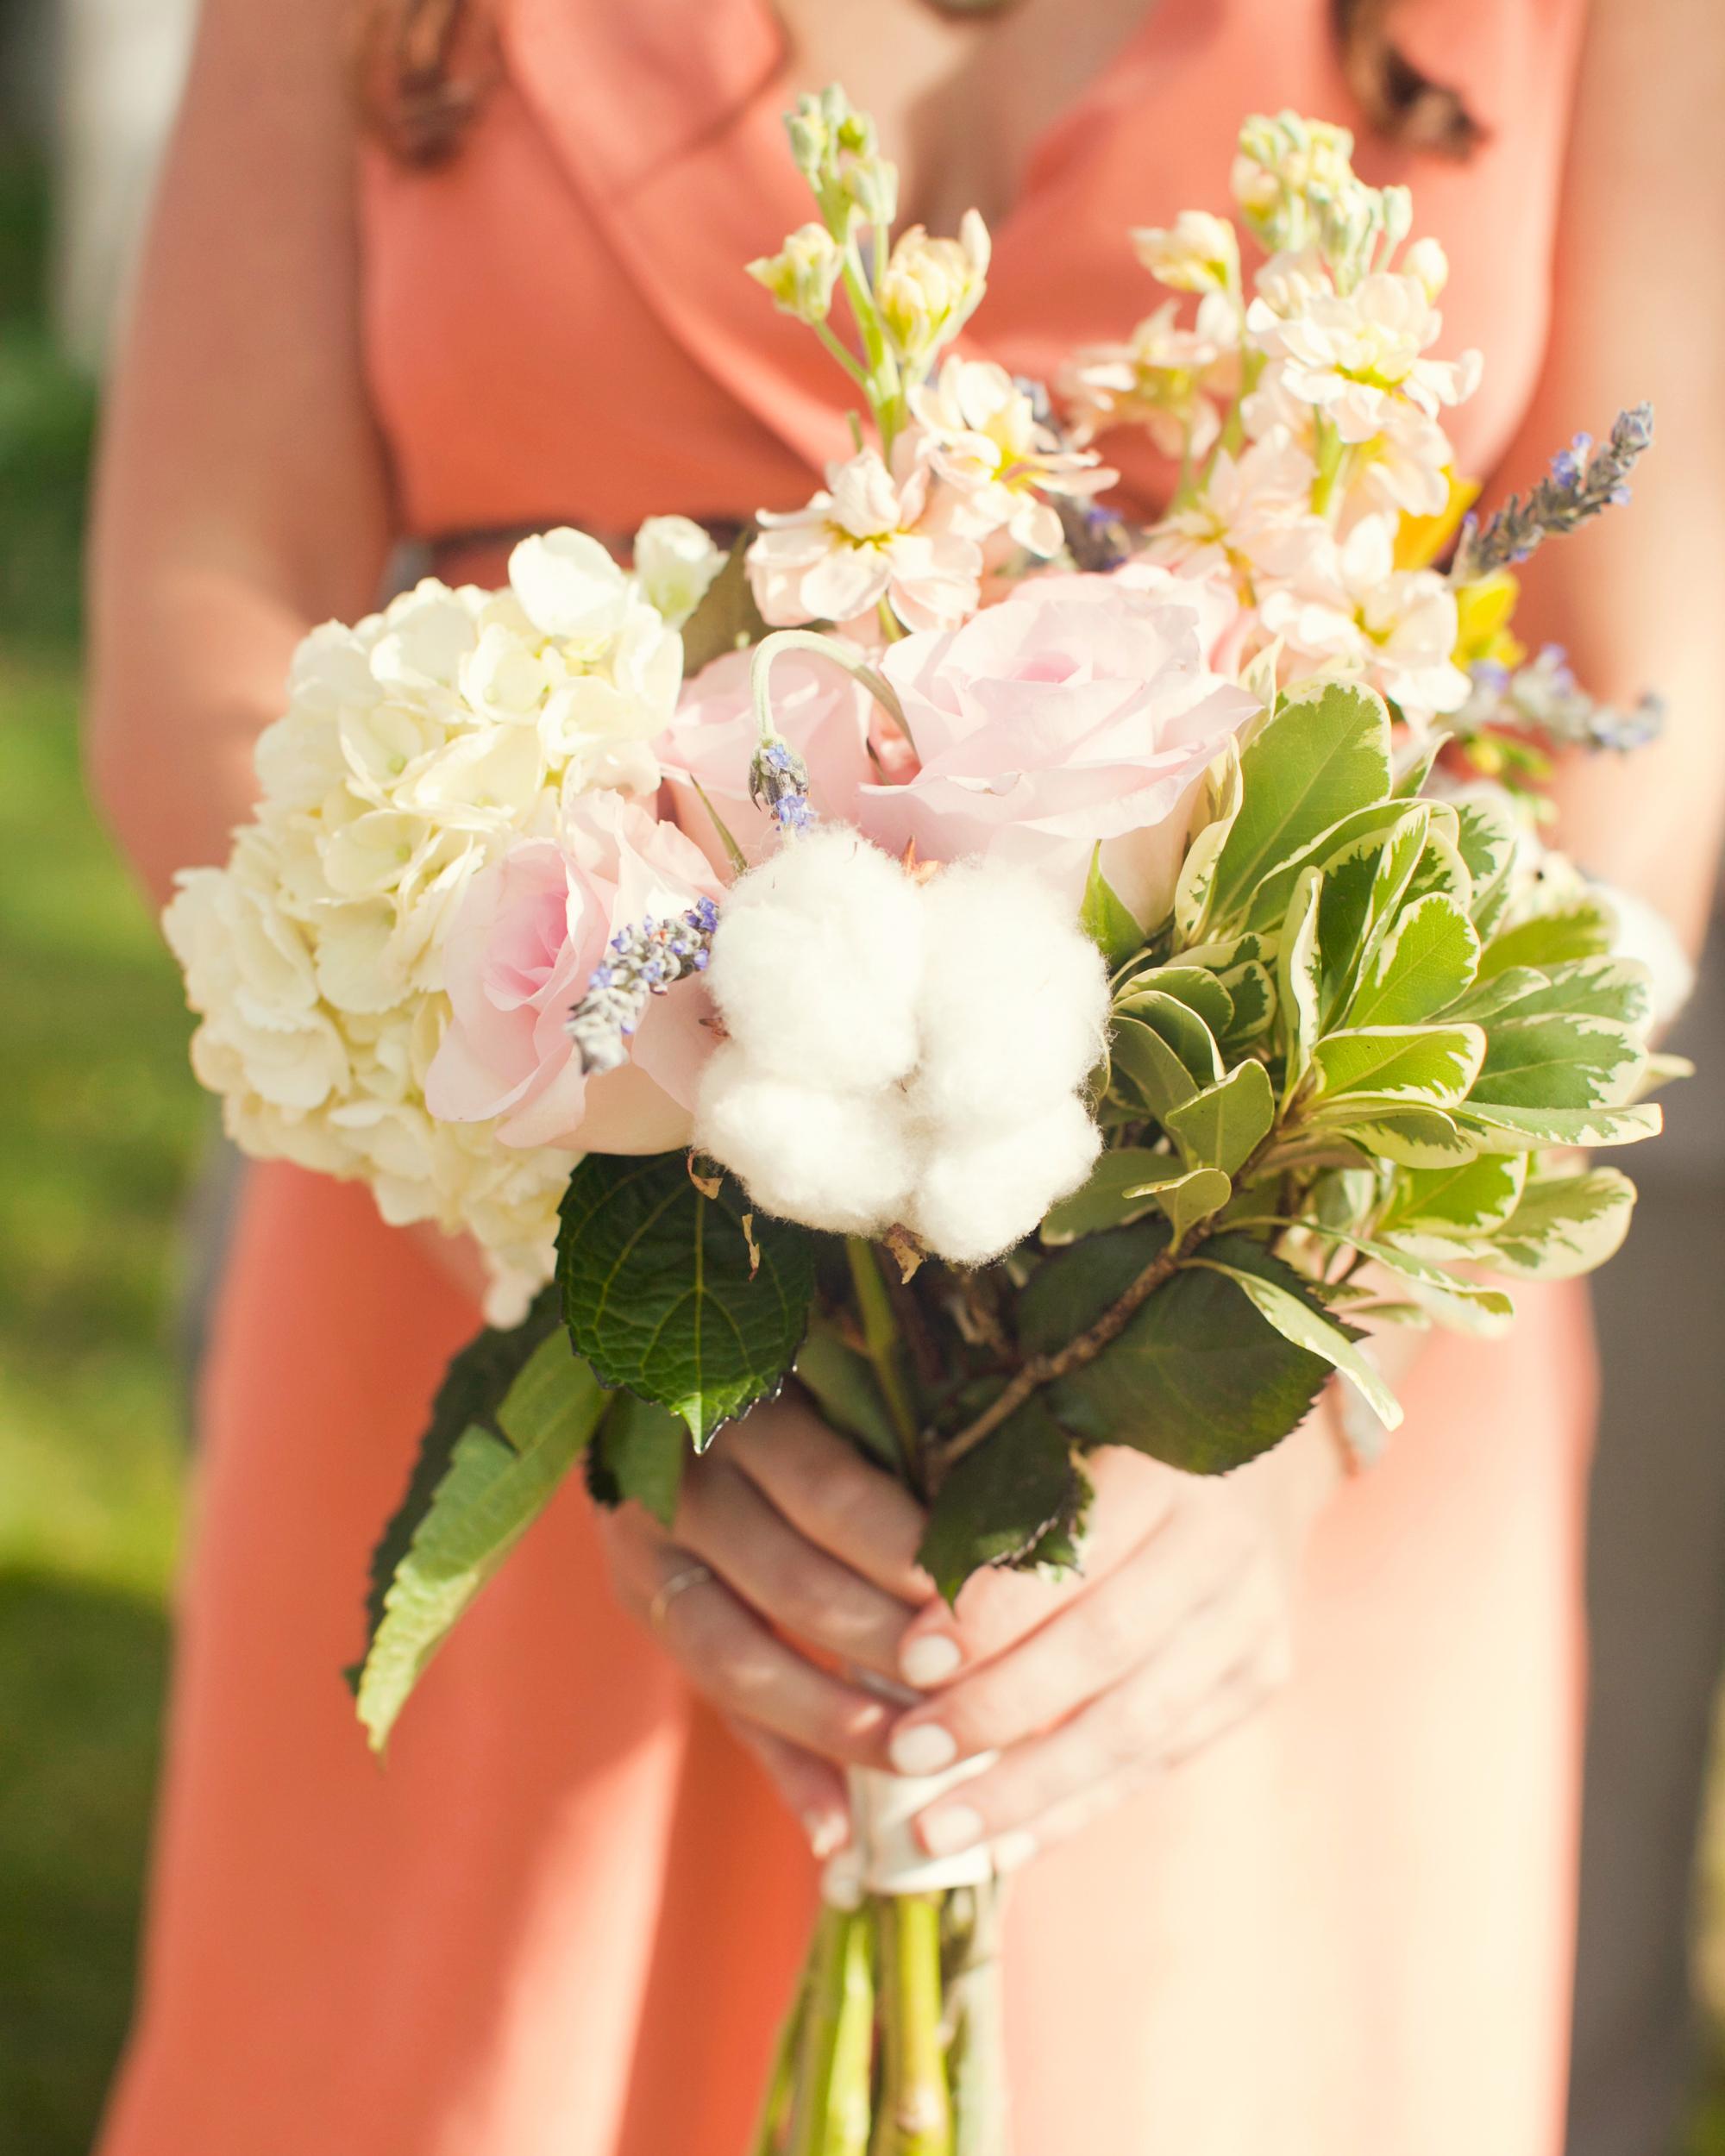 real-weddings-abby-julian-0711-252.jpg